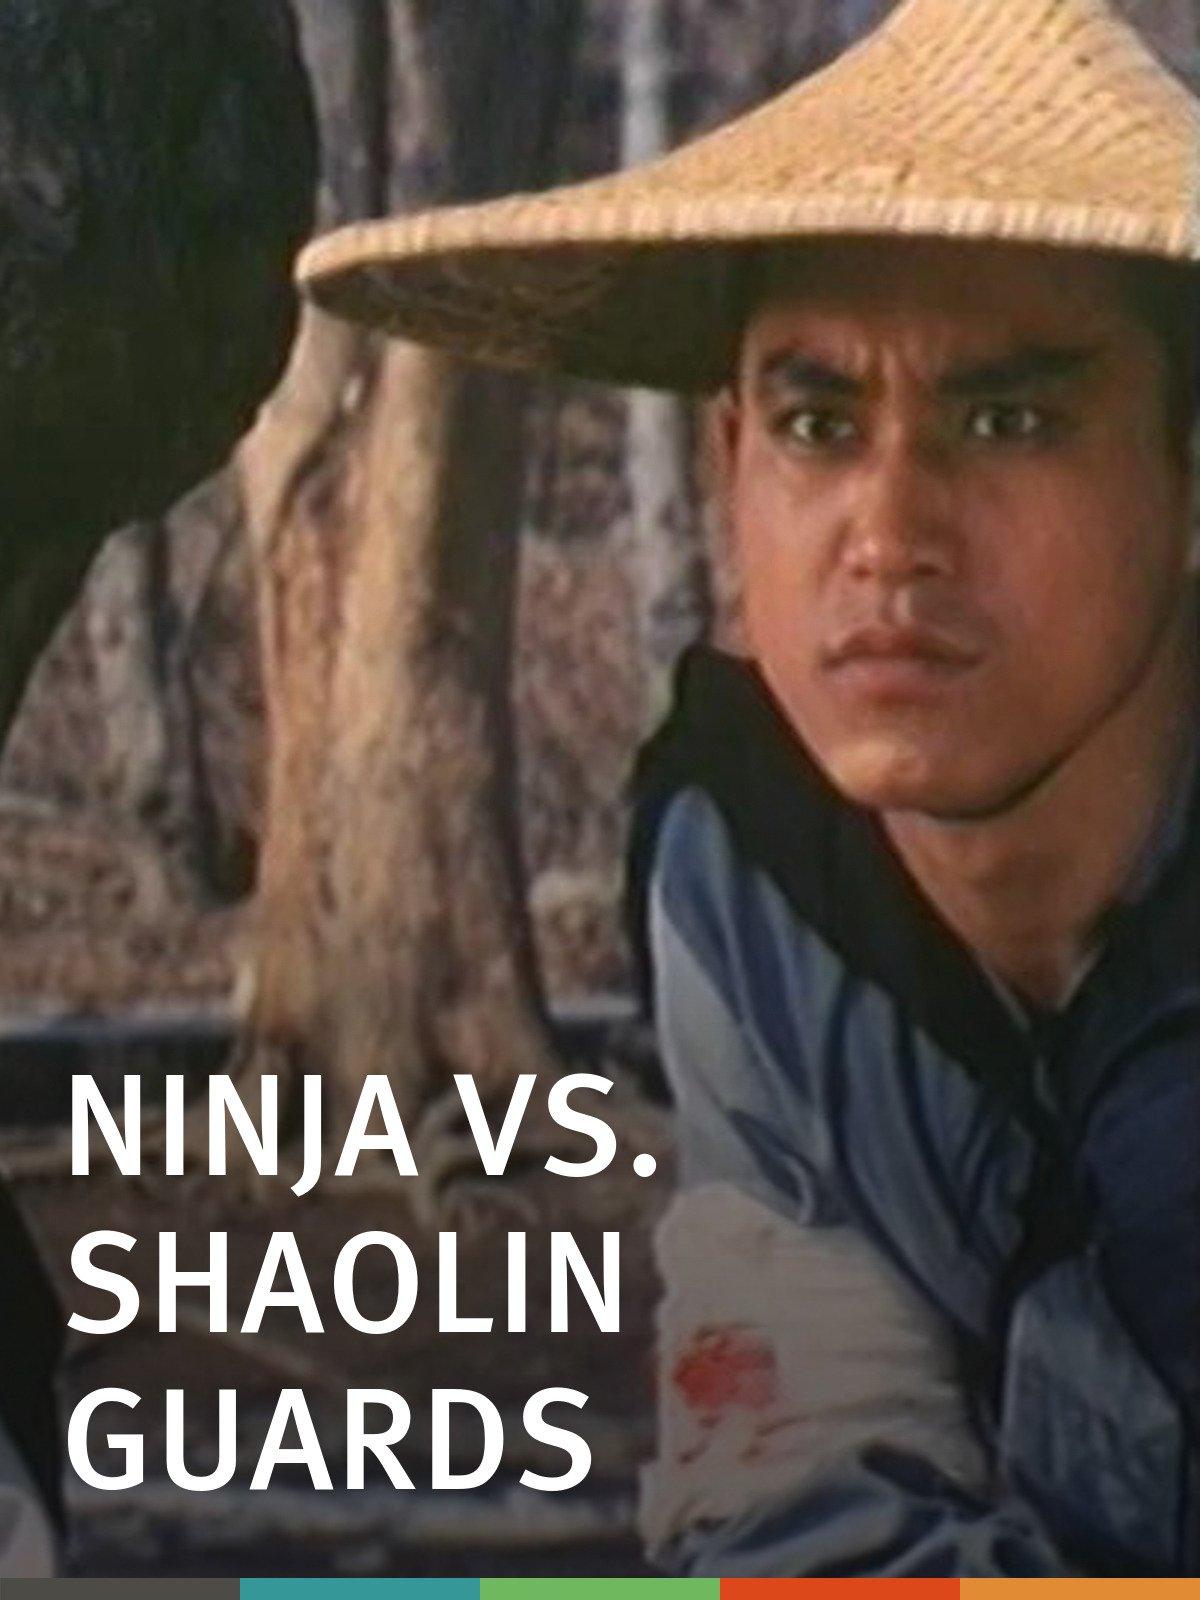 Amazon.com: Watch Ninja vs. Shaolin Guards | Prime Video